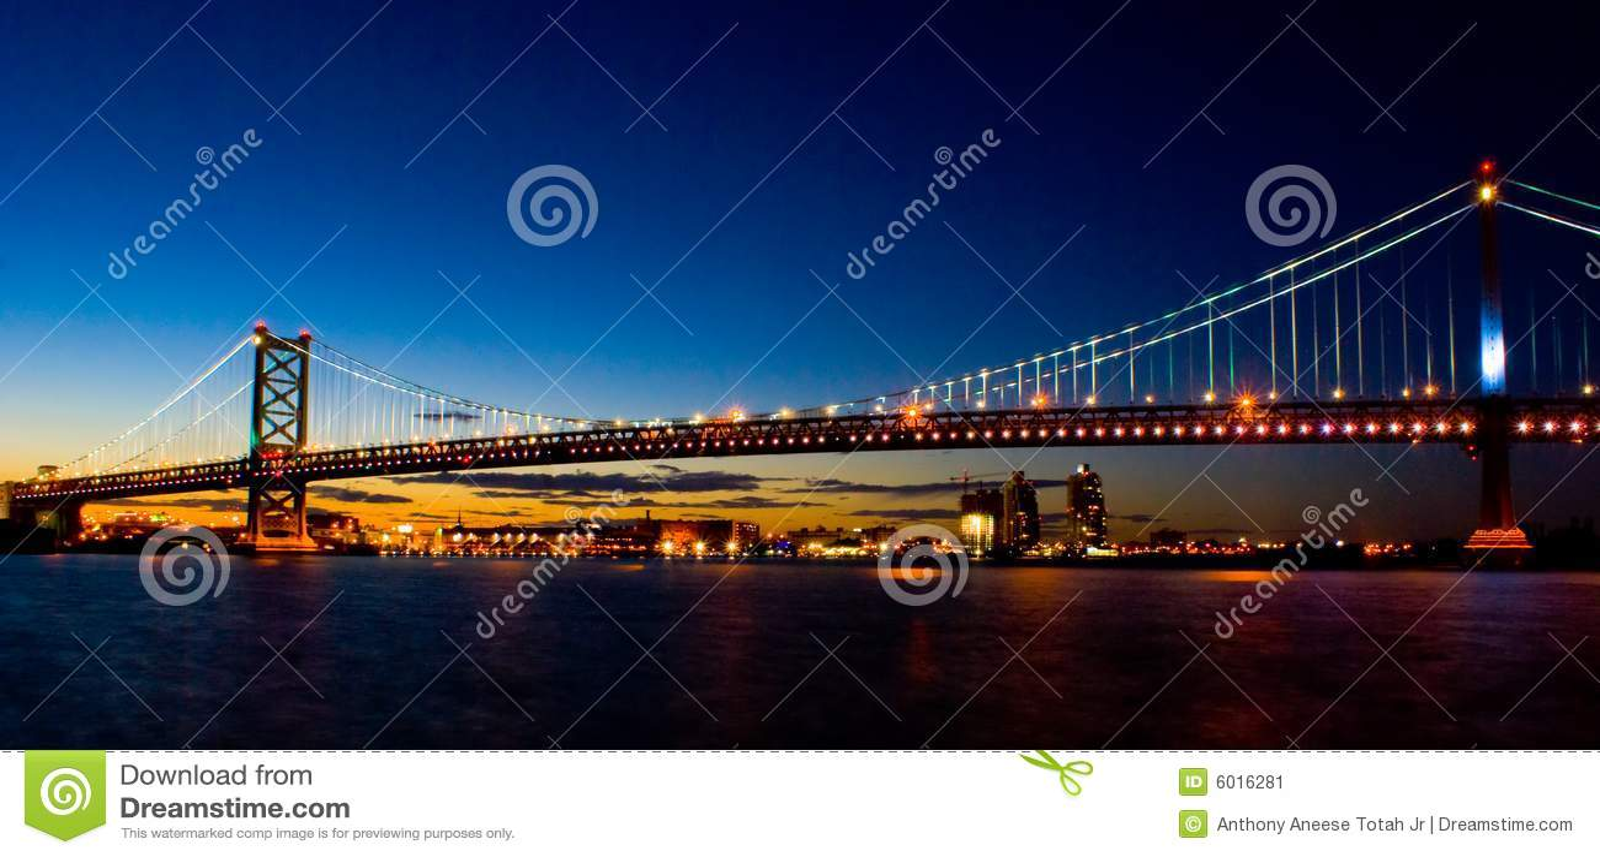 Benjamin Franklin Bridge at Sunset